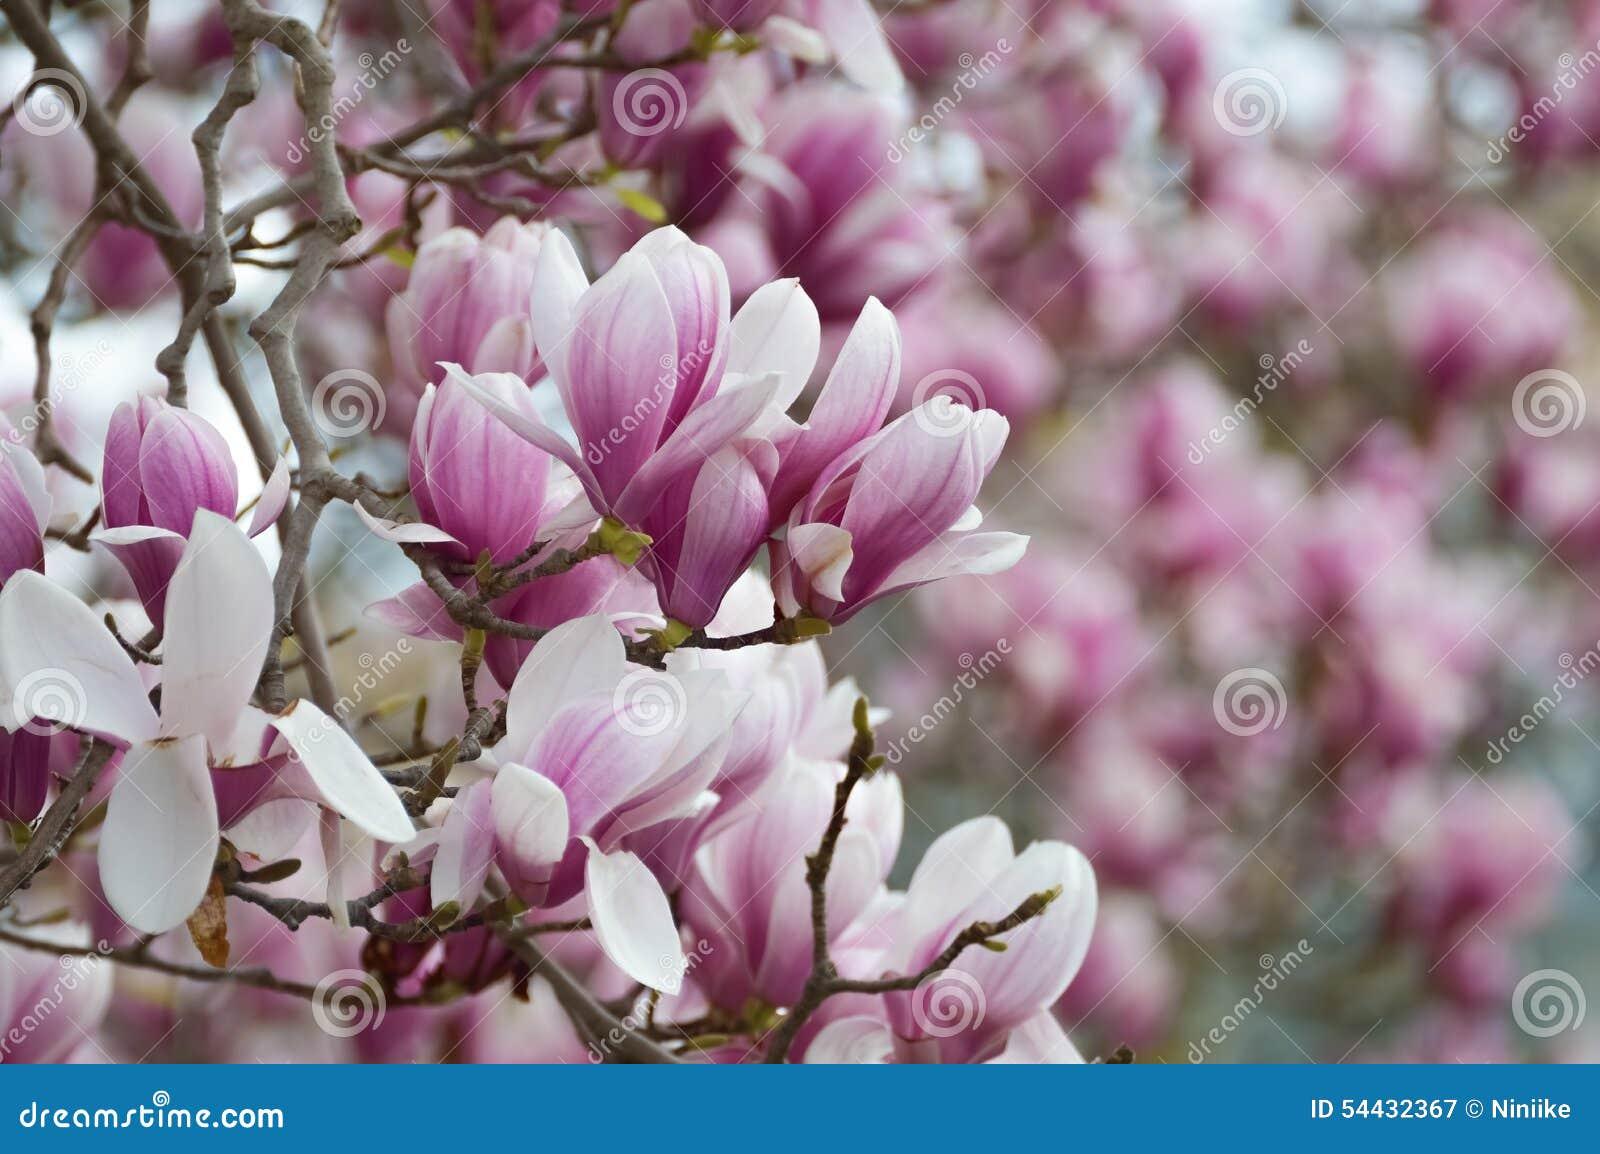 Old magnolia tree full of flowers stock image image of flower royalty free stock photo mightylinksfo